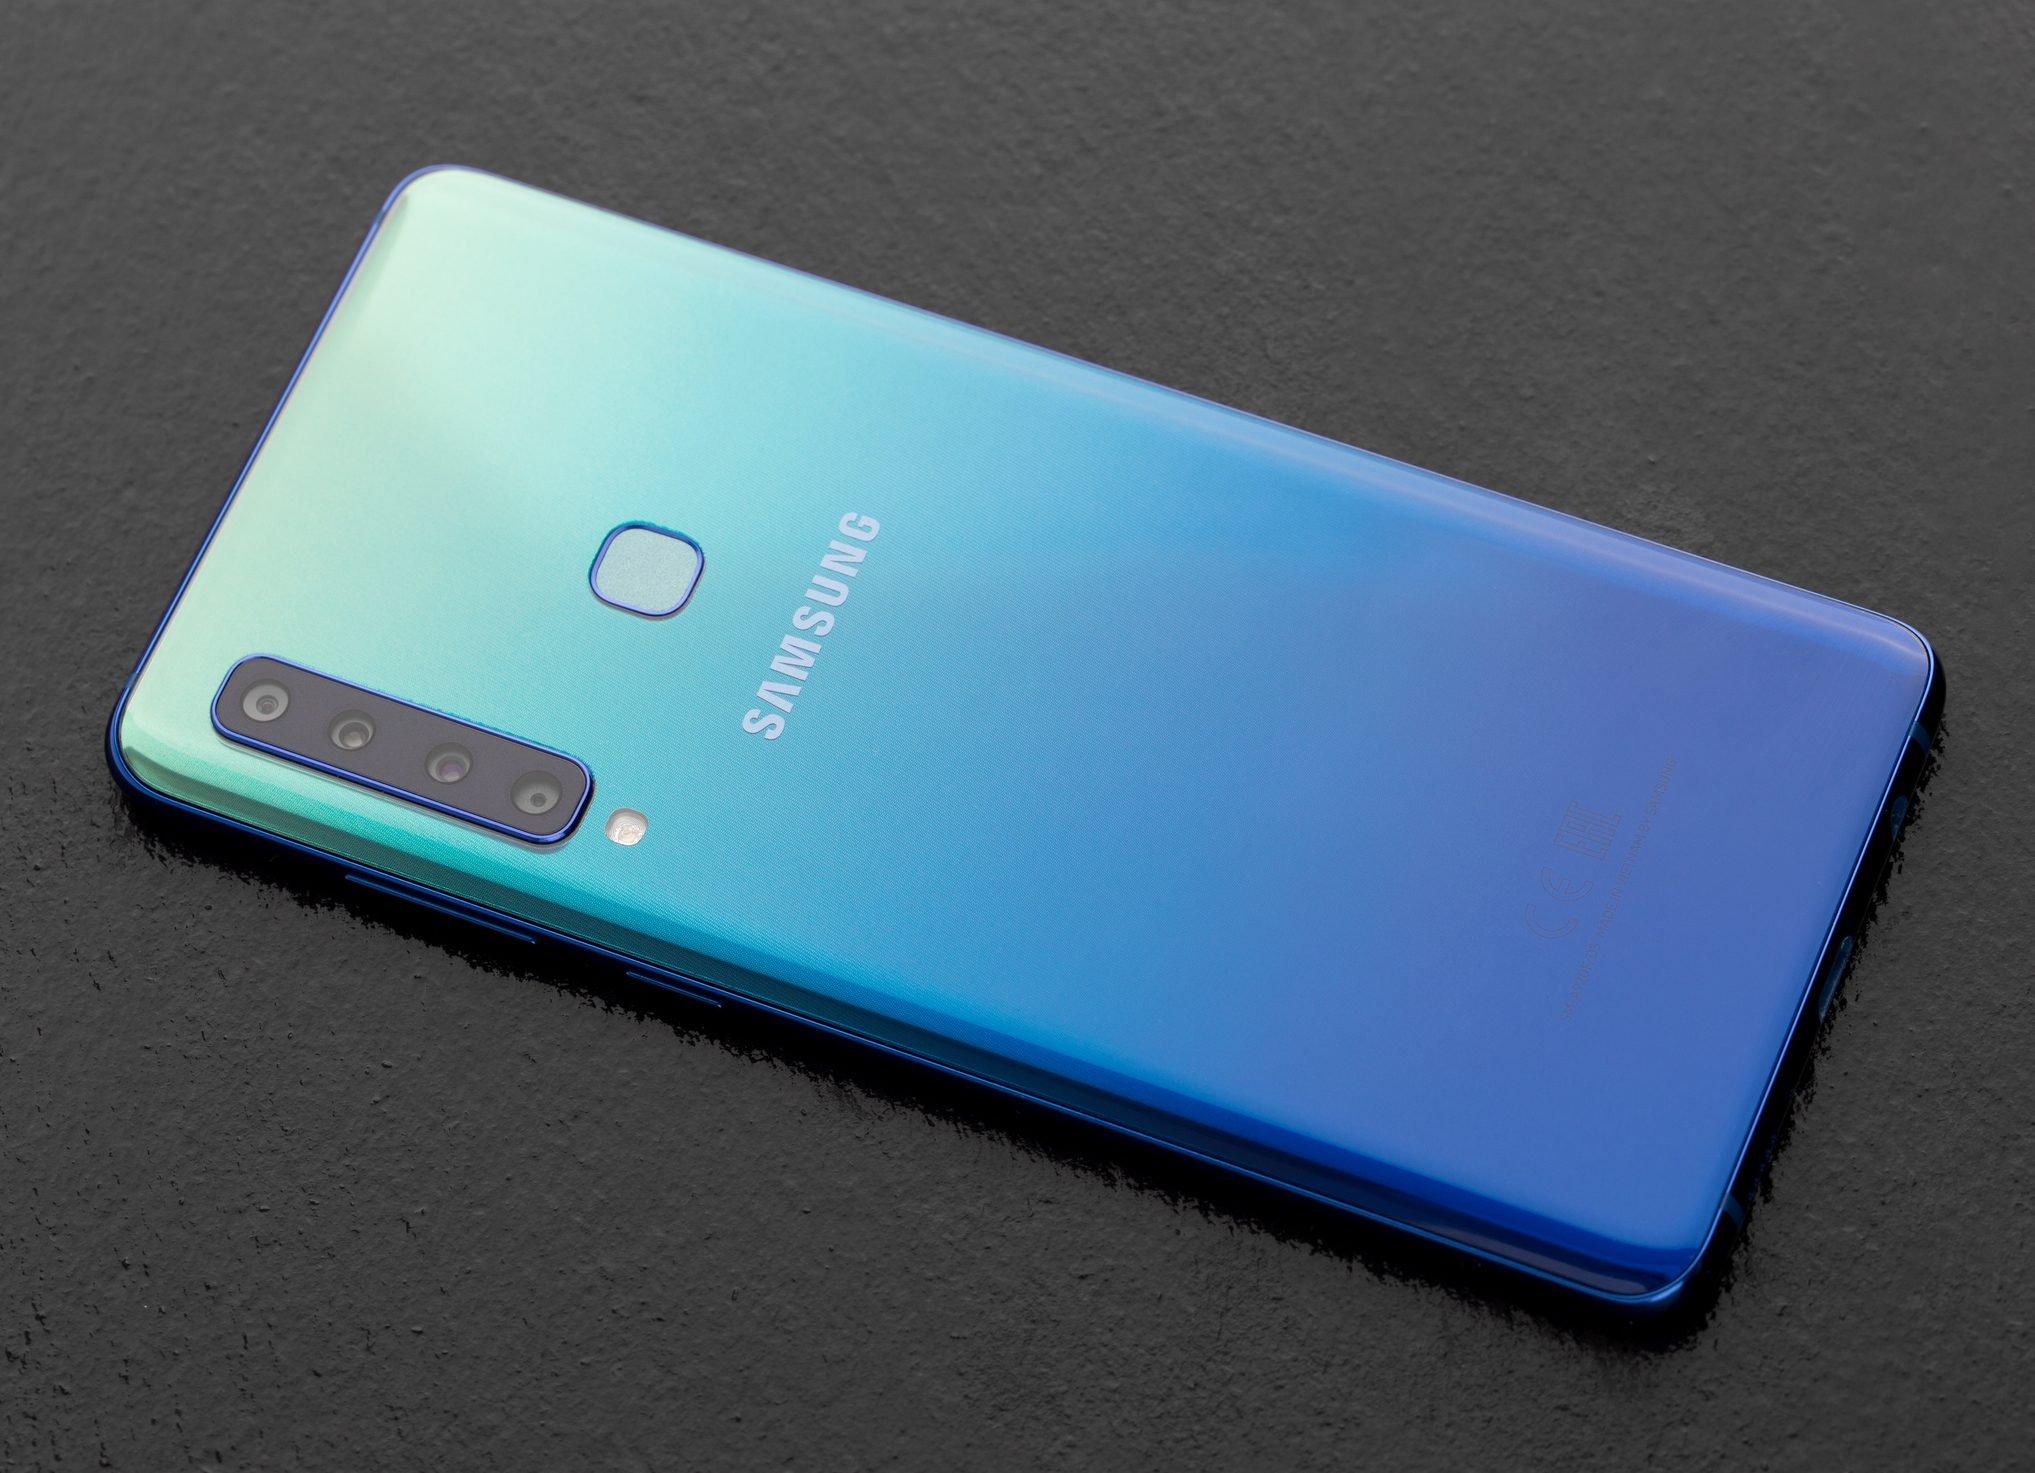 Samsung Galaxy A9 on slate surface.